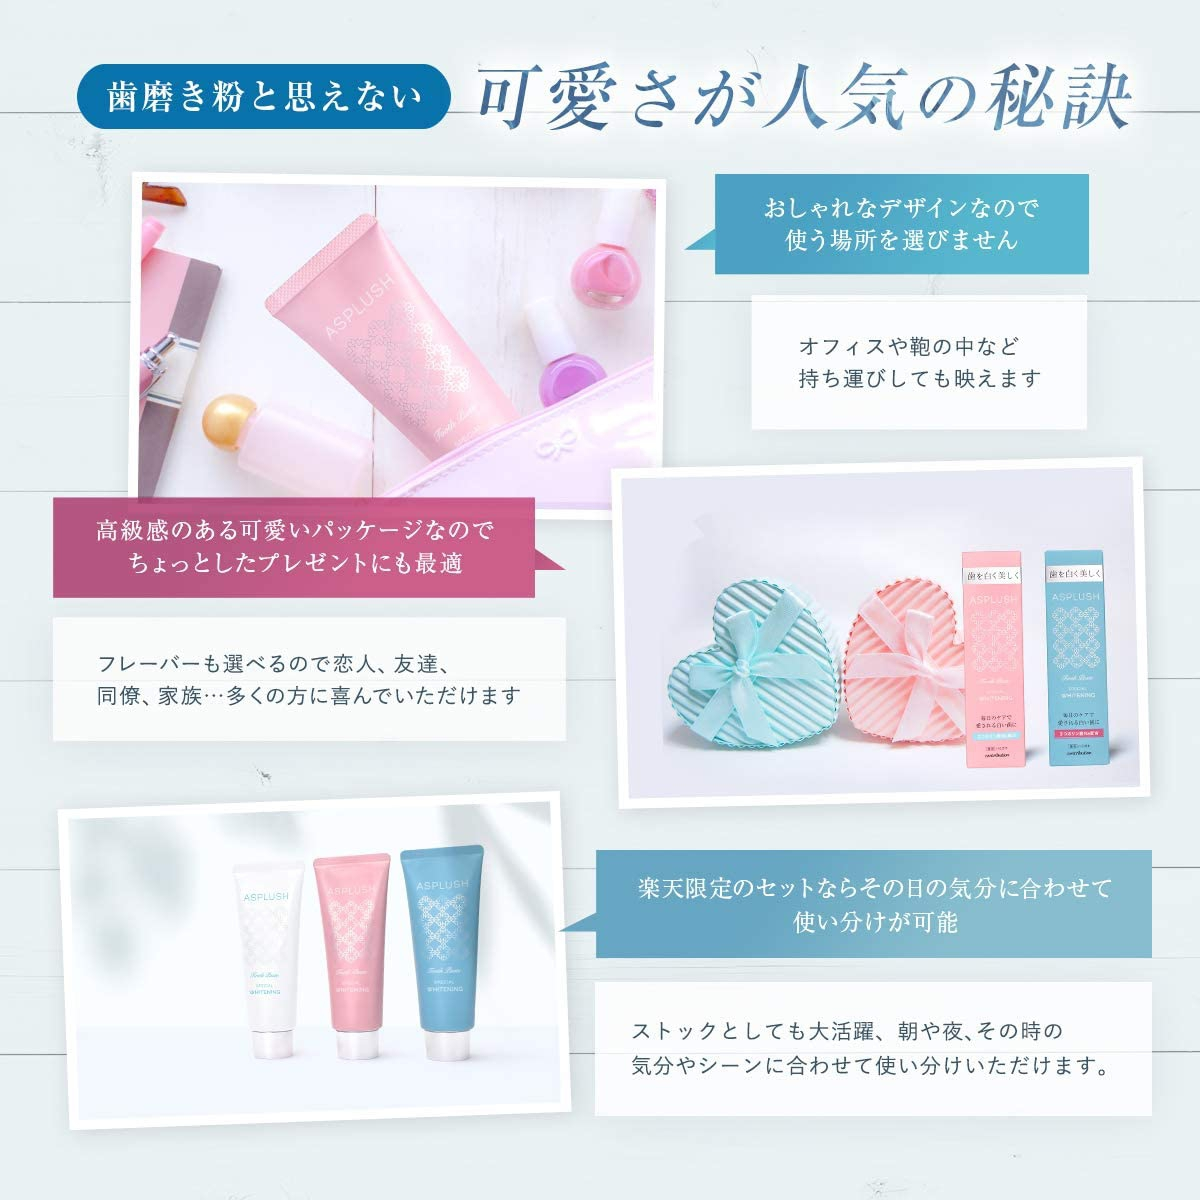 ASPLUSH(アスプラッシュ)ホワイトニング 歯磨き粉の商品画像12